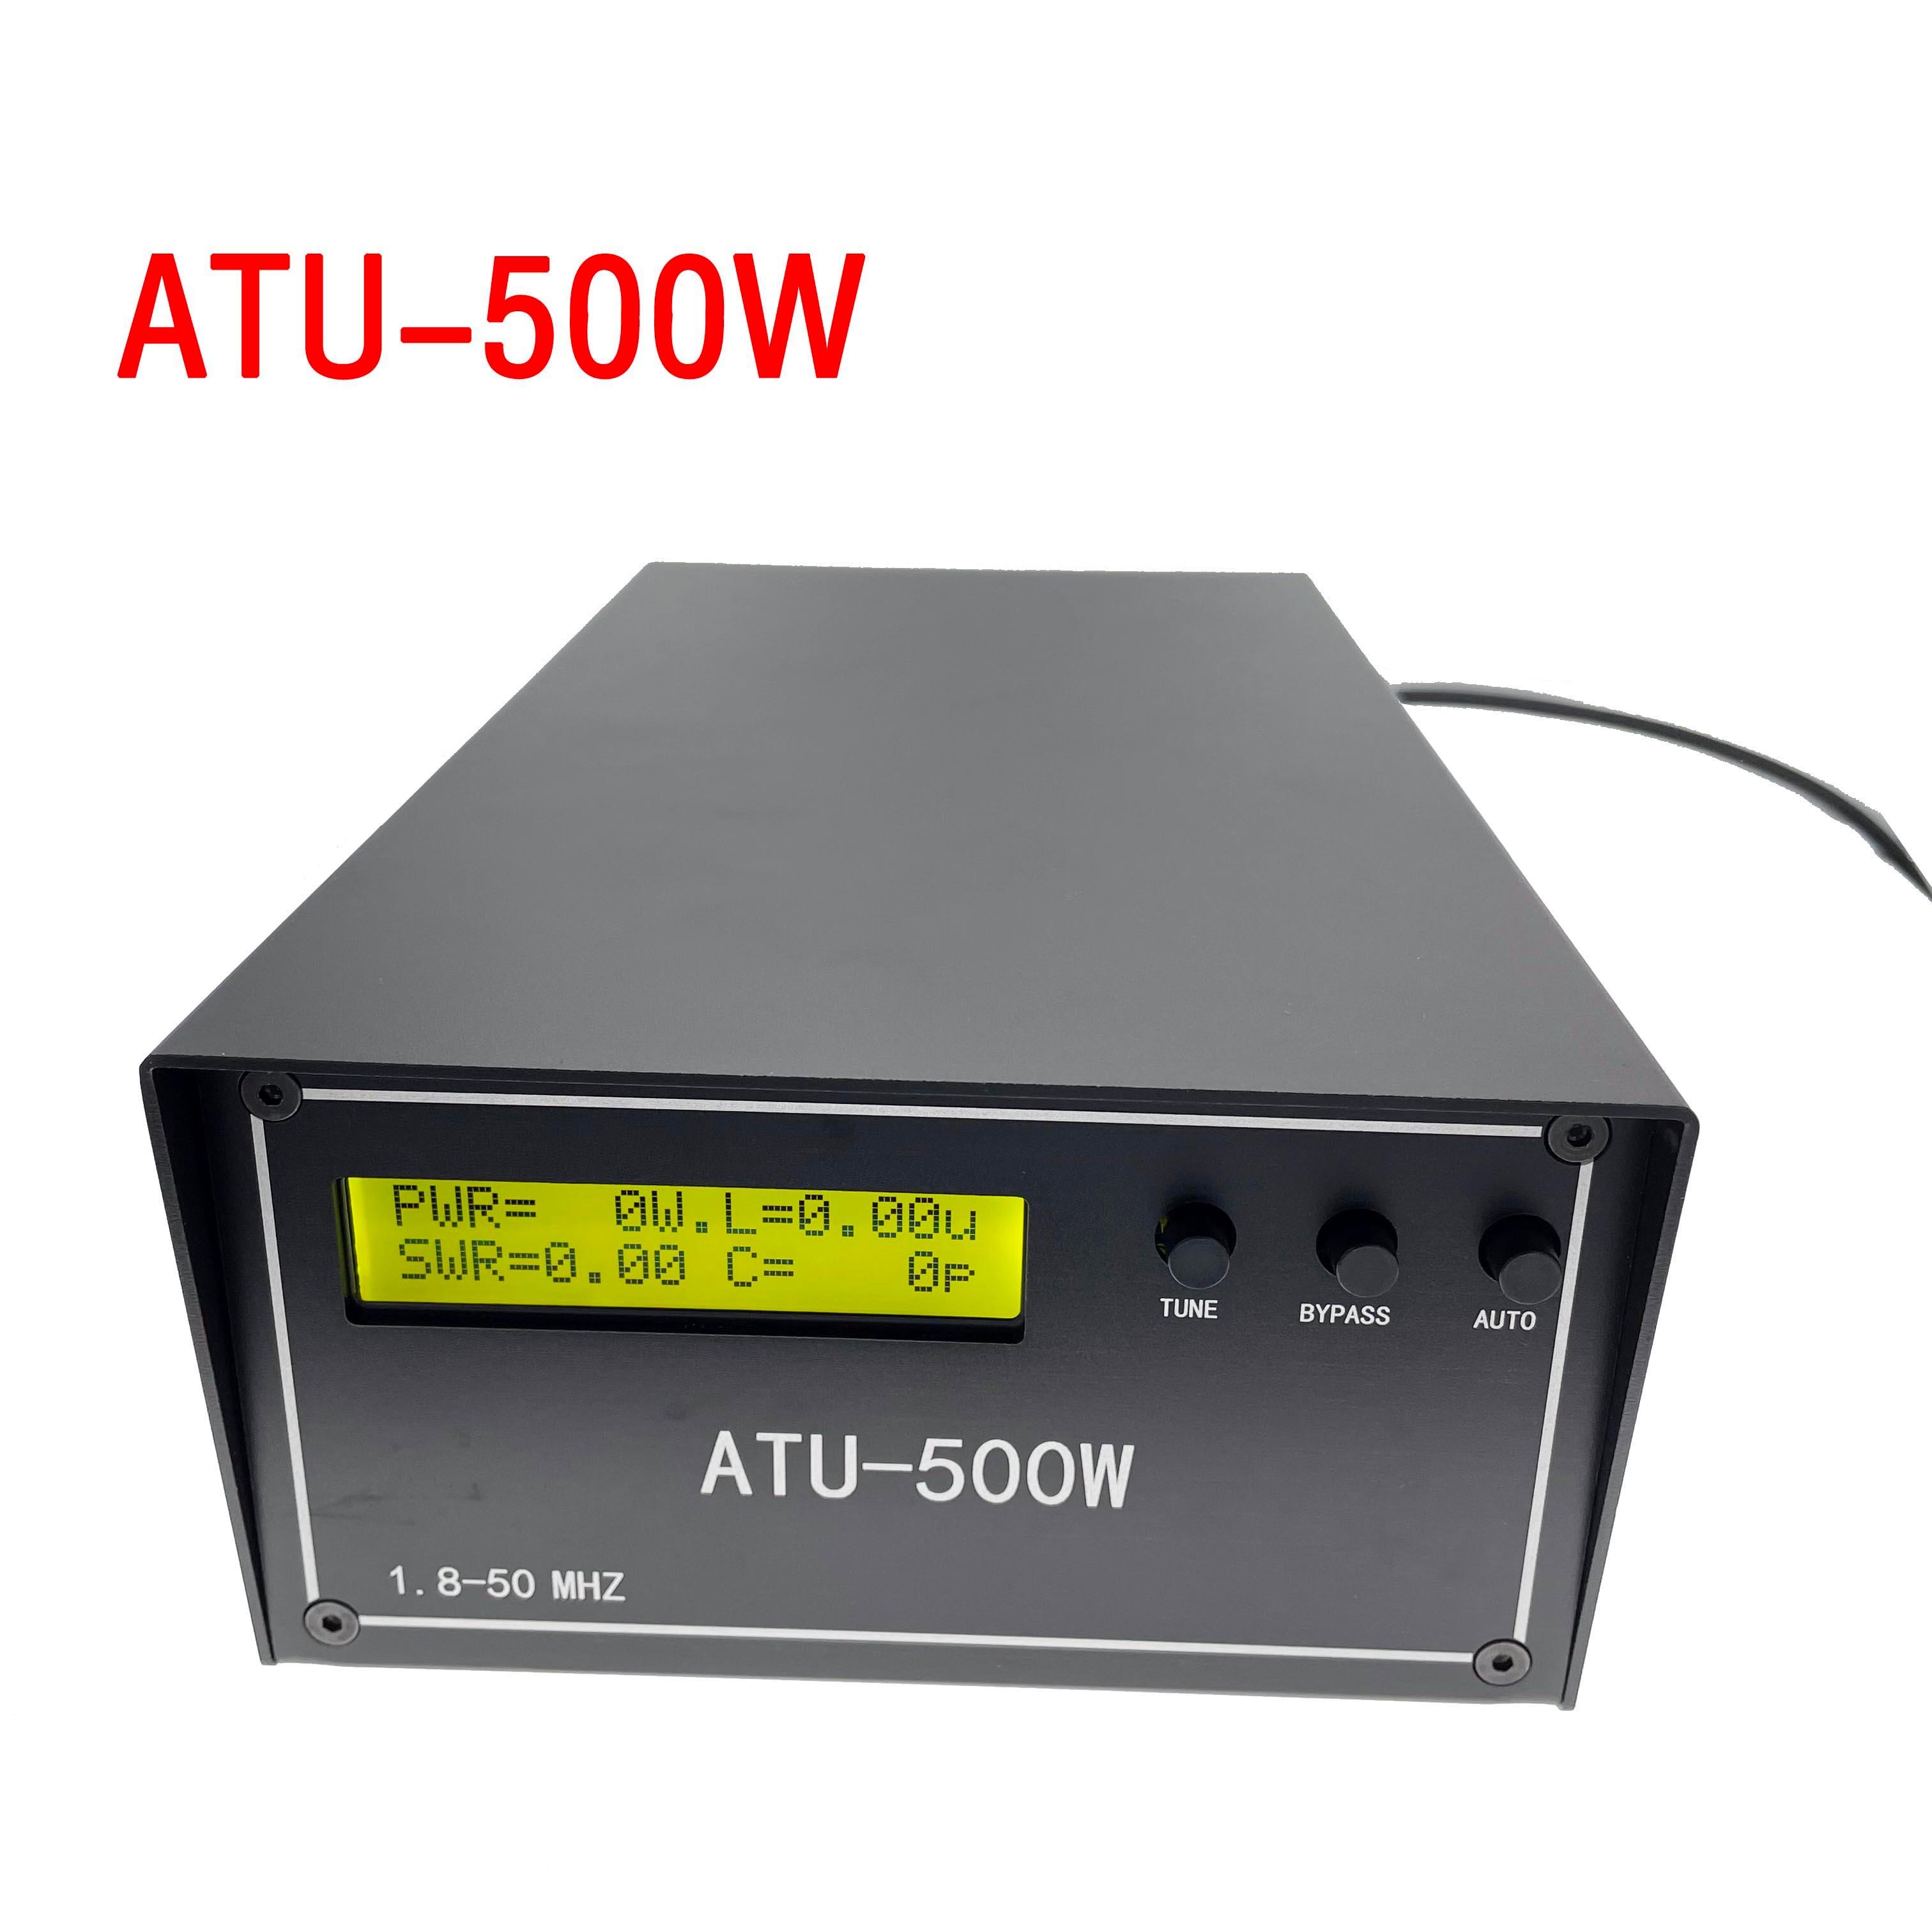 ATU-500W ATU500 التلقائي هوائي موالف ATU-500 N7DDC